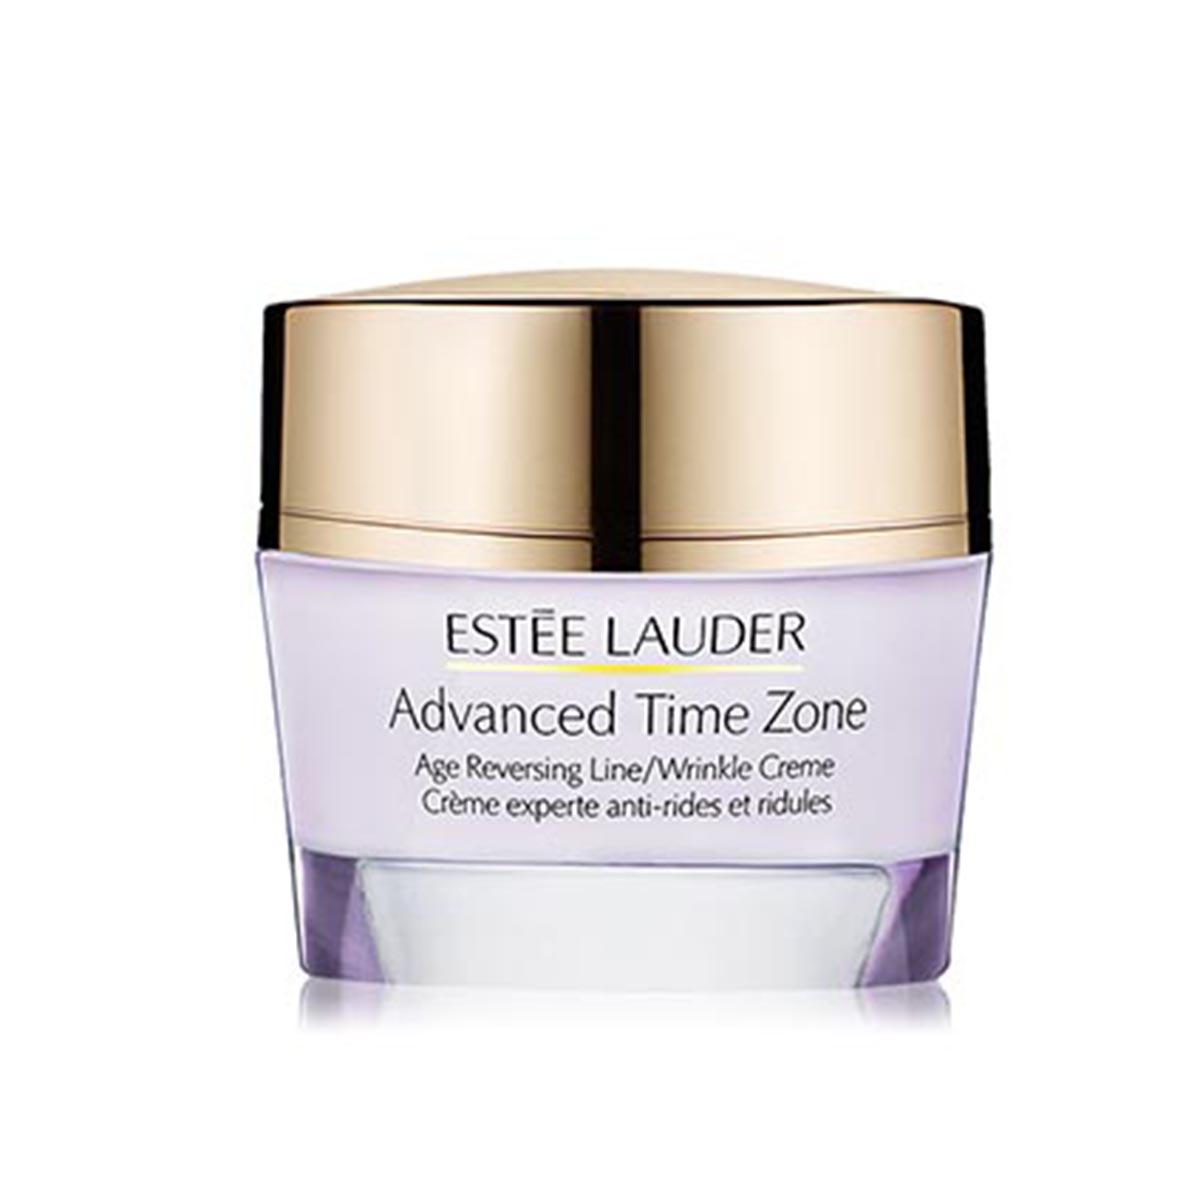 Estee lauder advanced time zone piel normal spf15 50ml